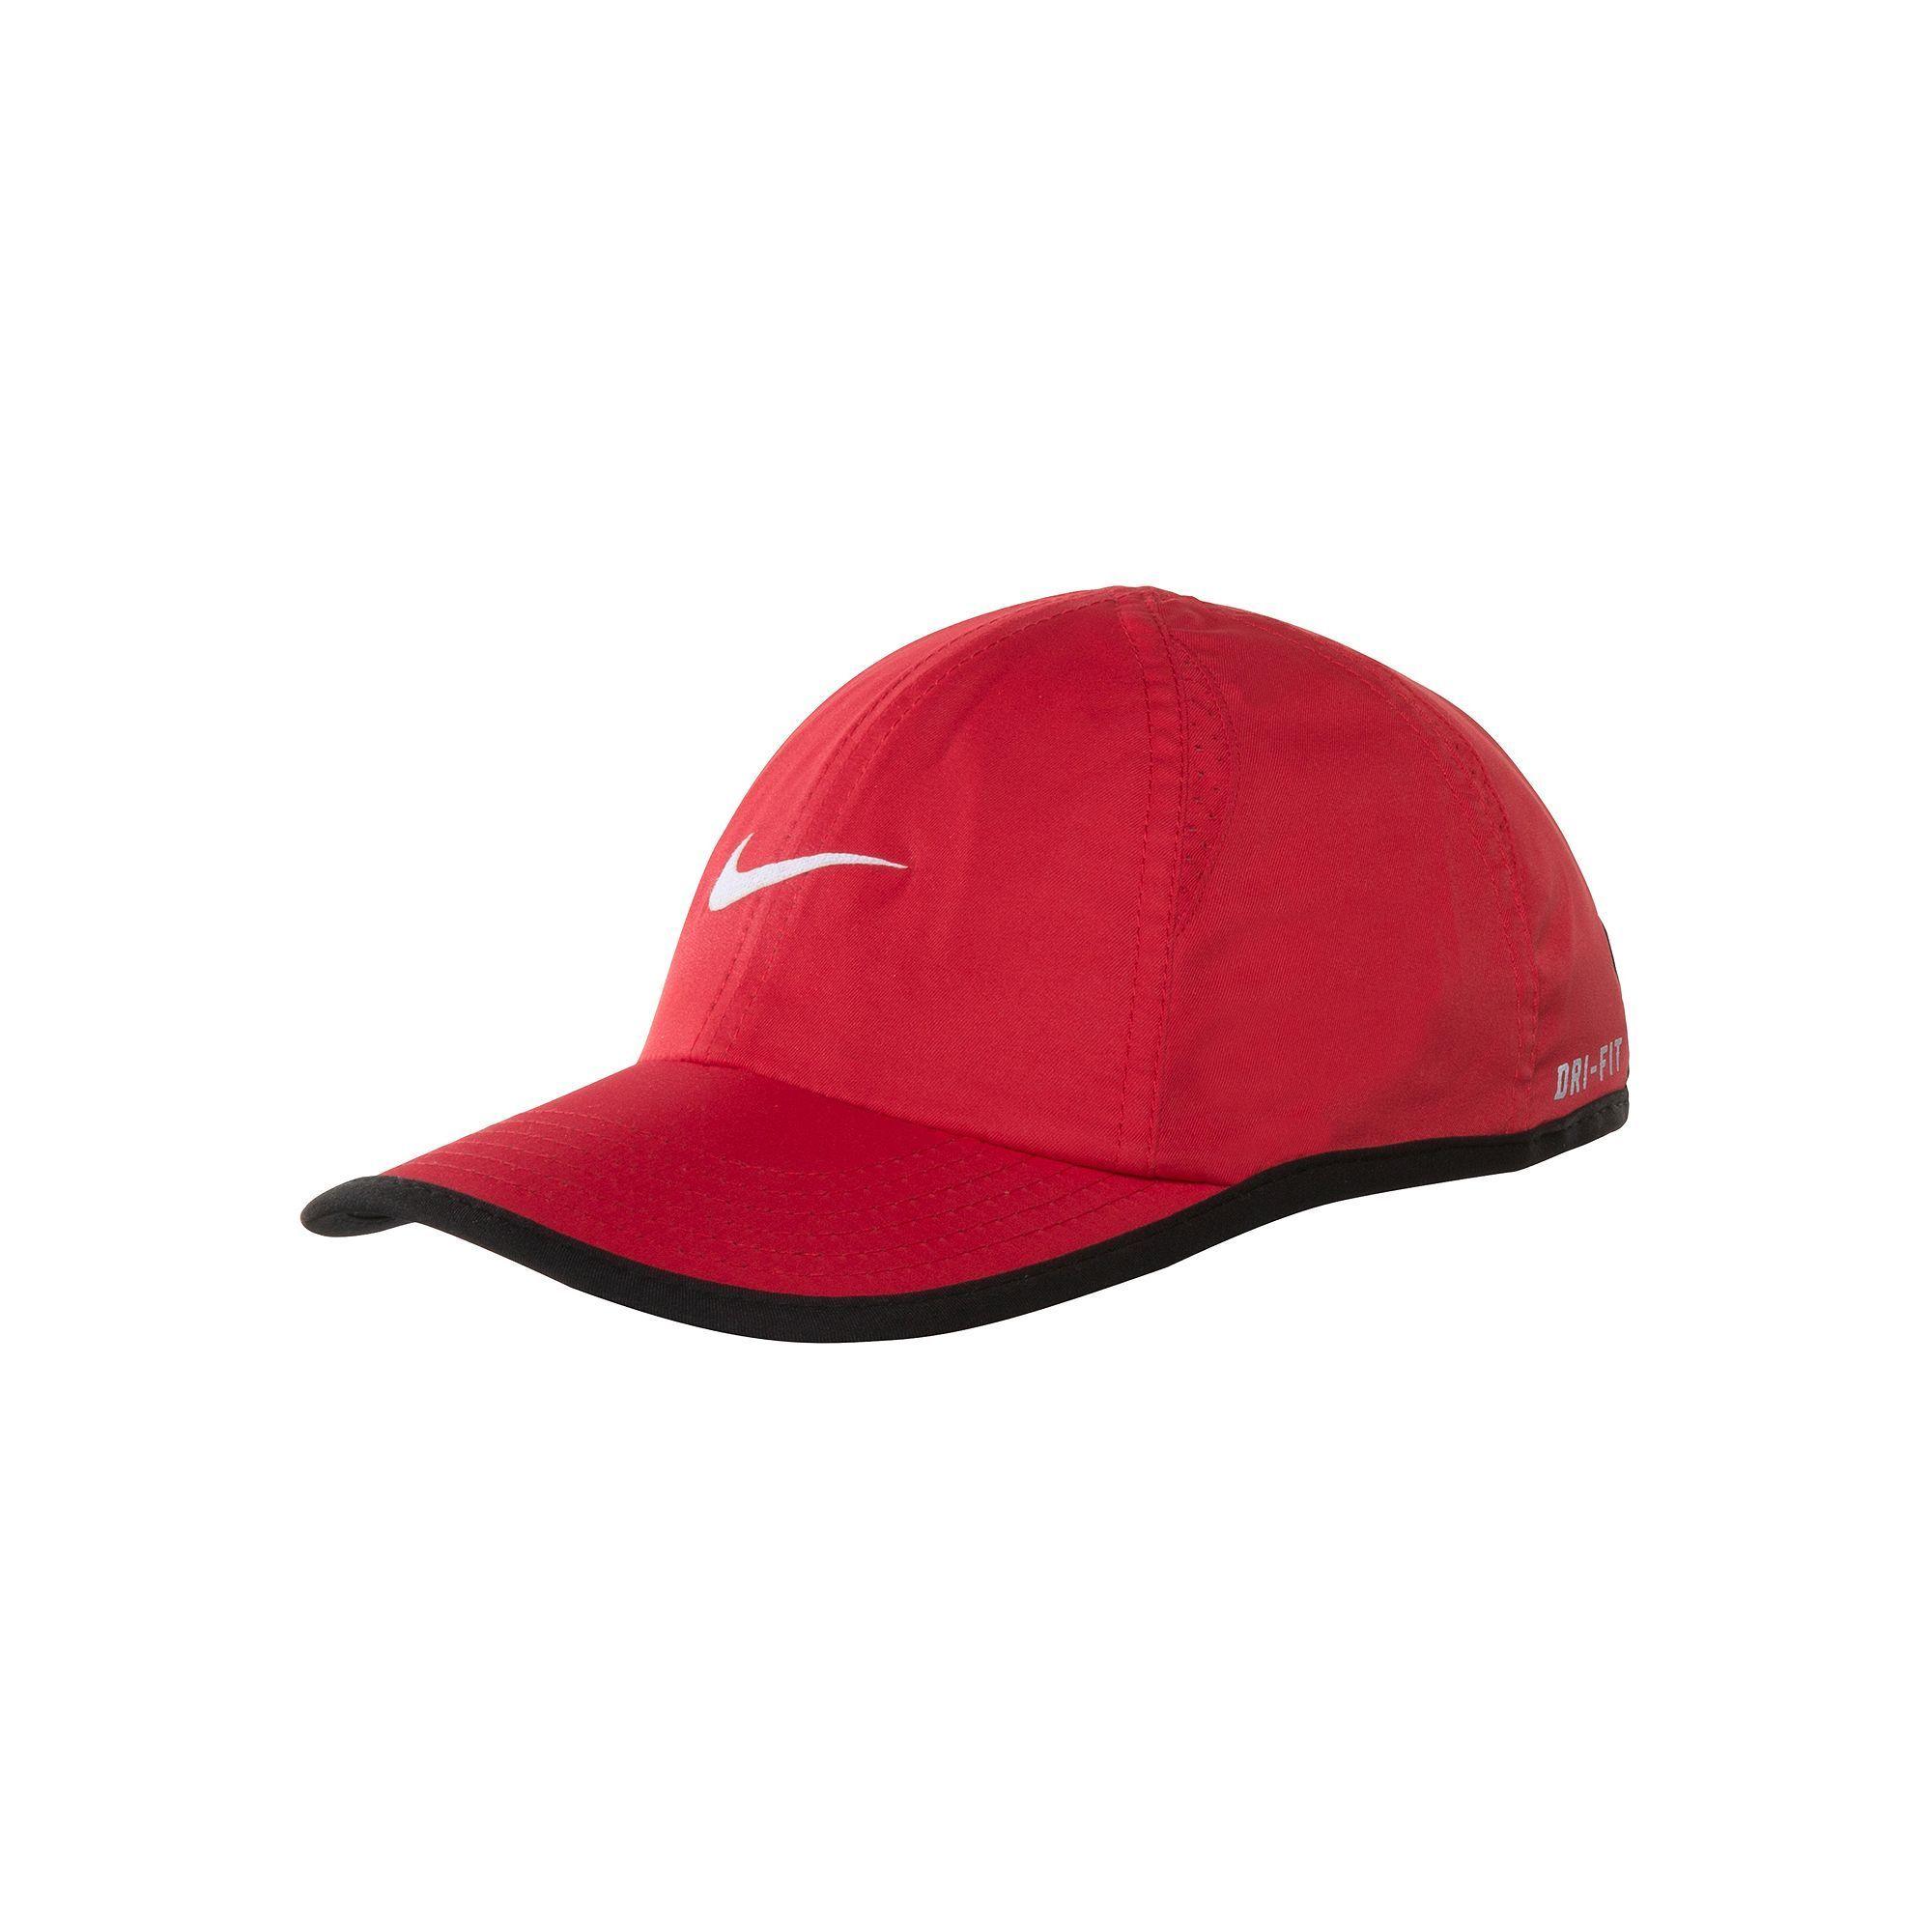 Baby Boy Nike Dri-FIT Feather Light Cap  67e6c116e1a